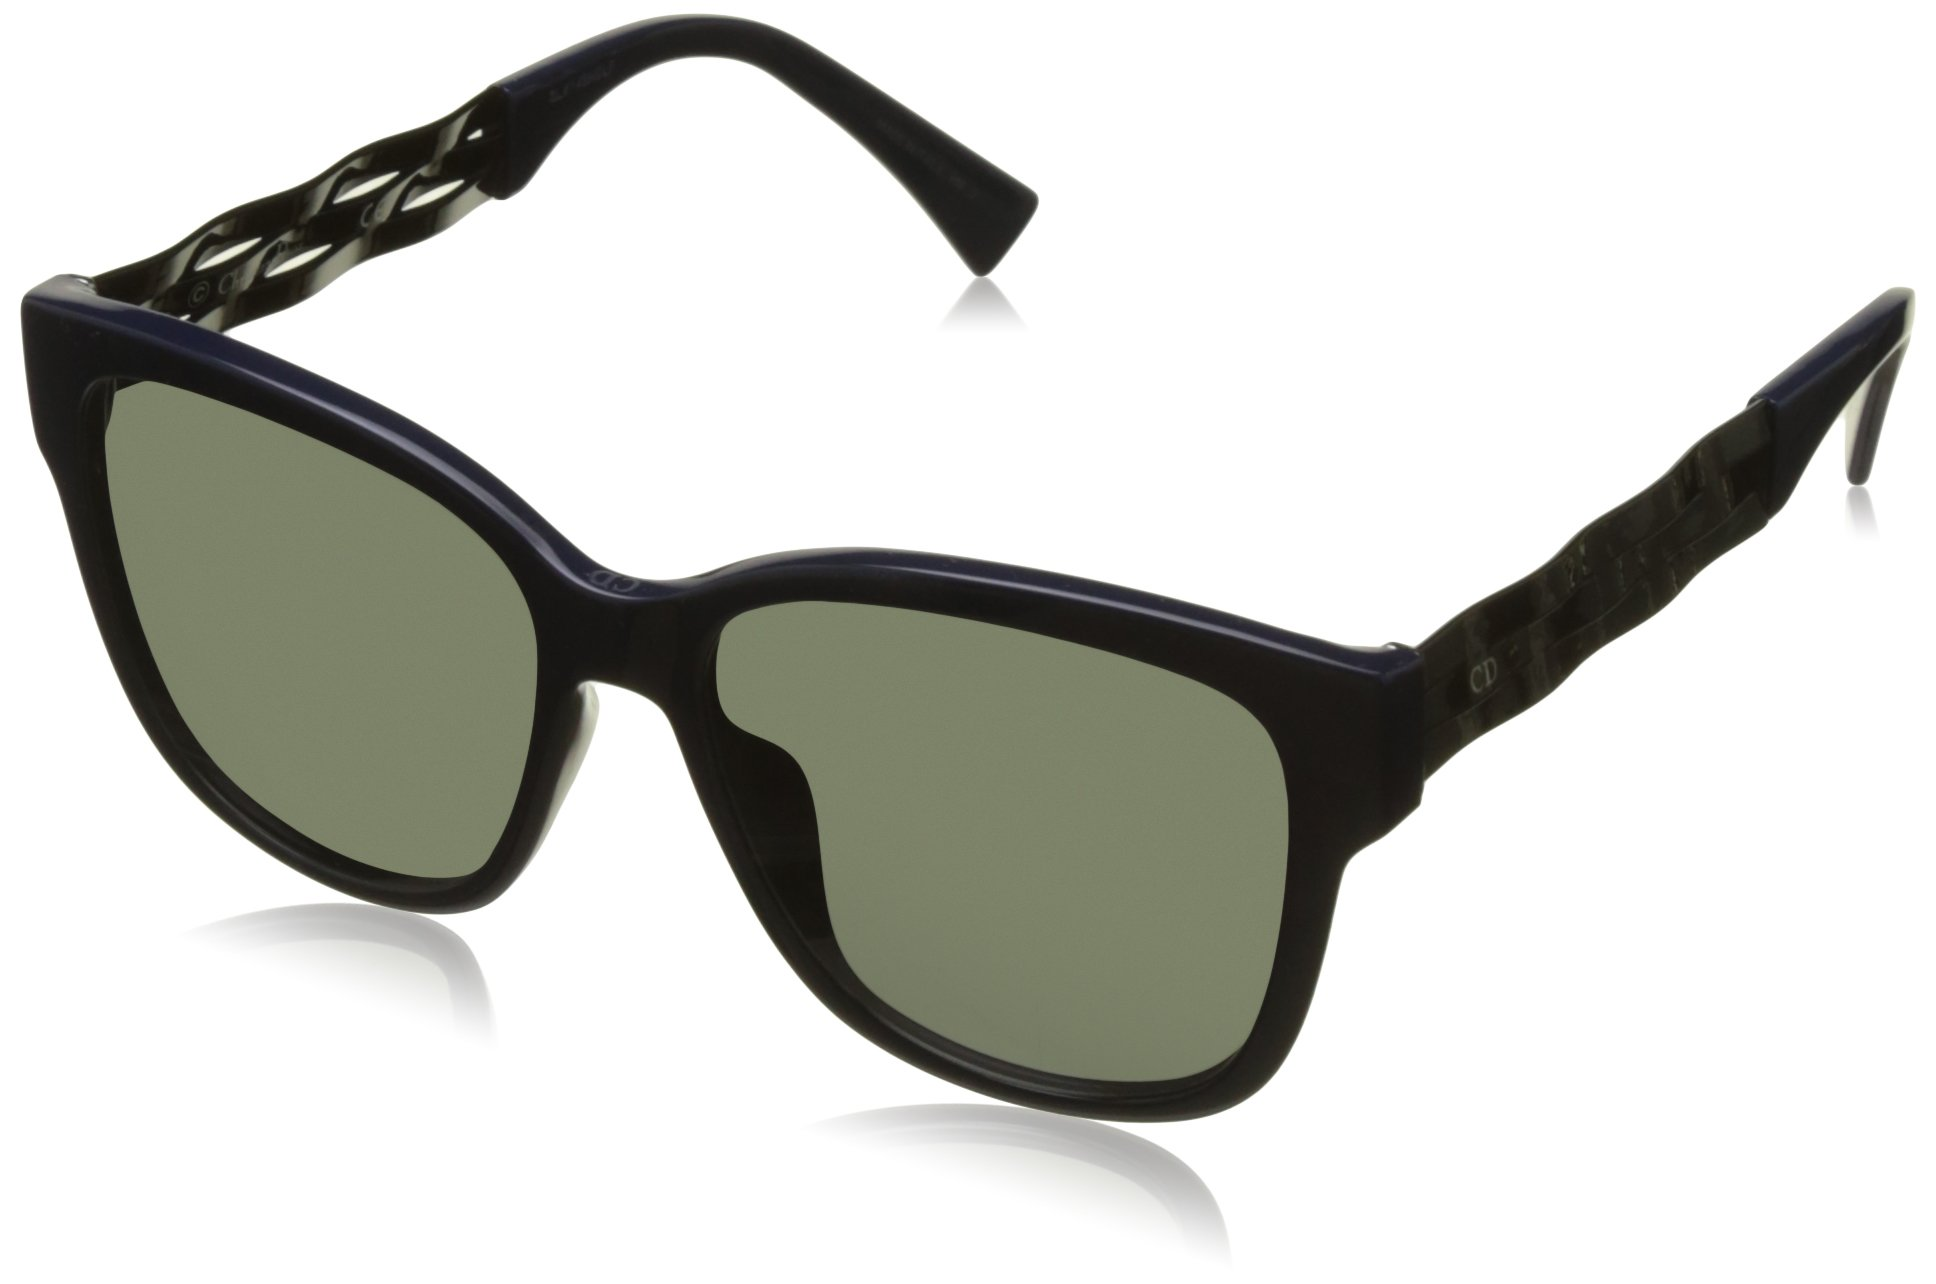 55 8a greyFemme De LunettesBleubluette Dior Diorribbon1n S5x Montures Black Christian Y6bgyvmIf7